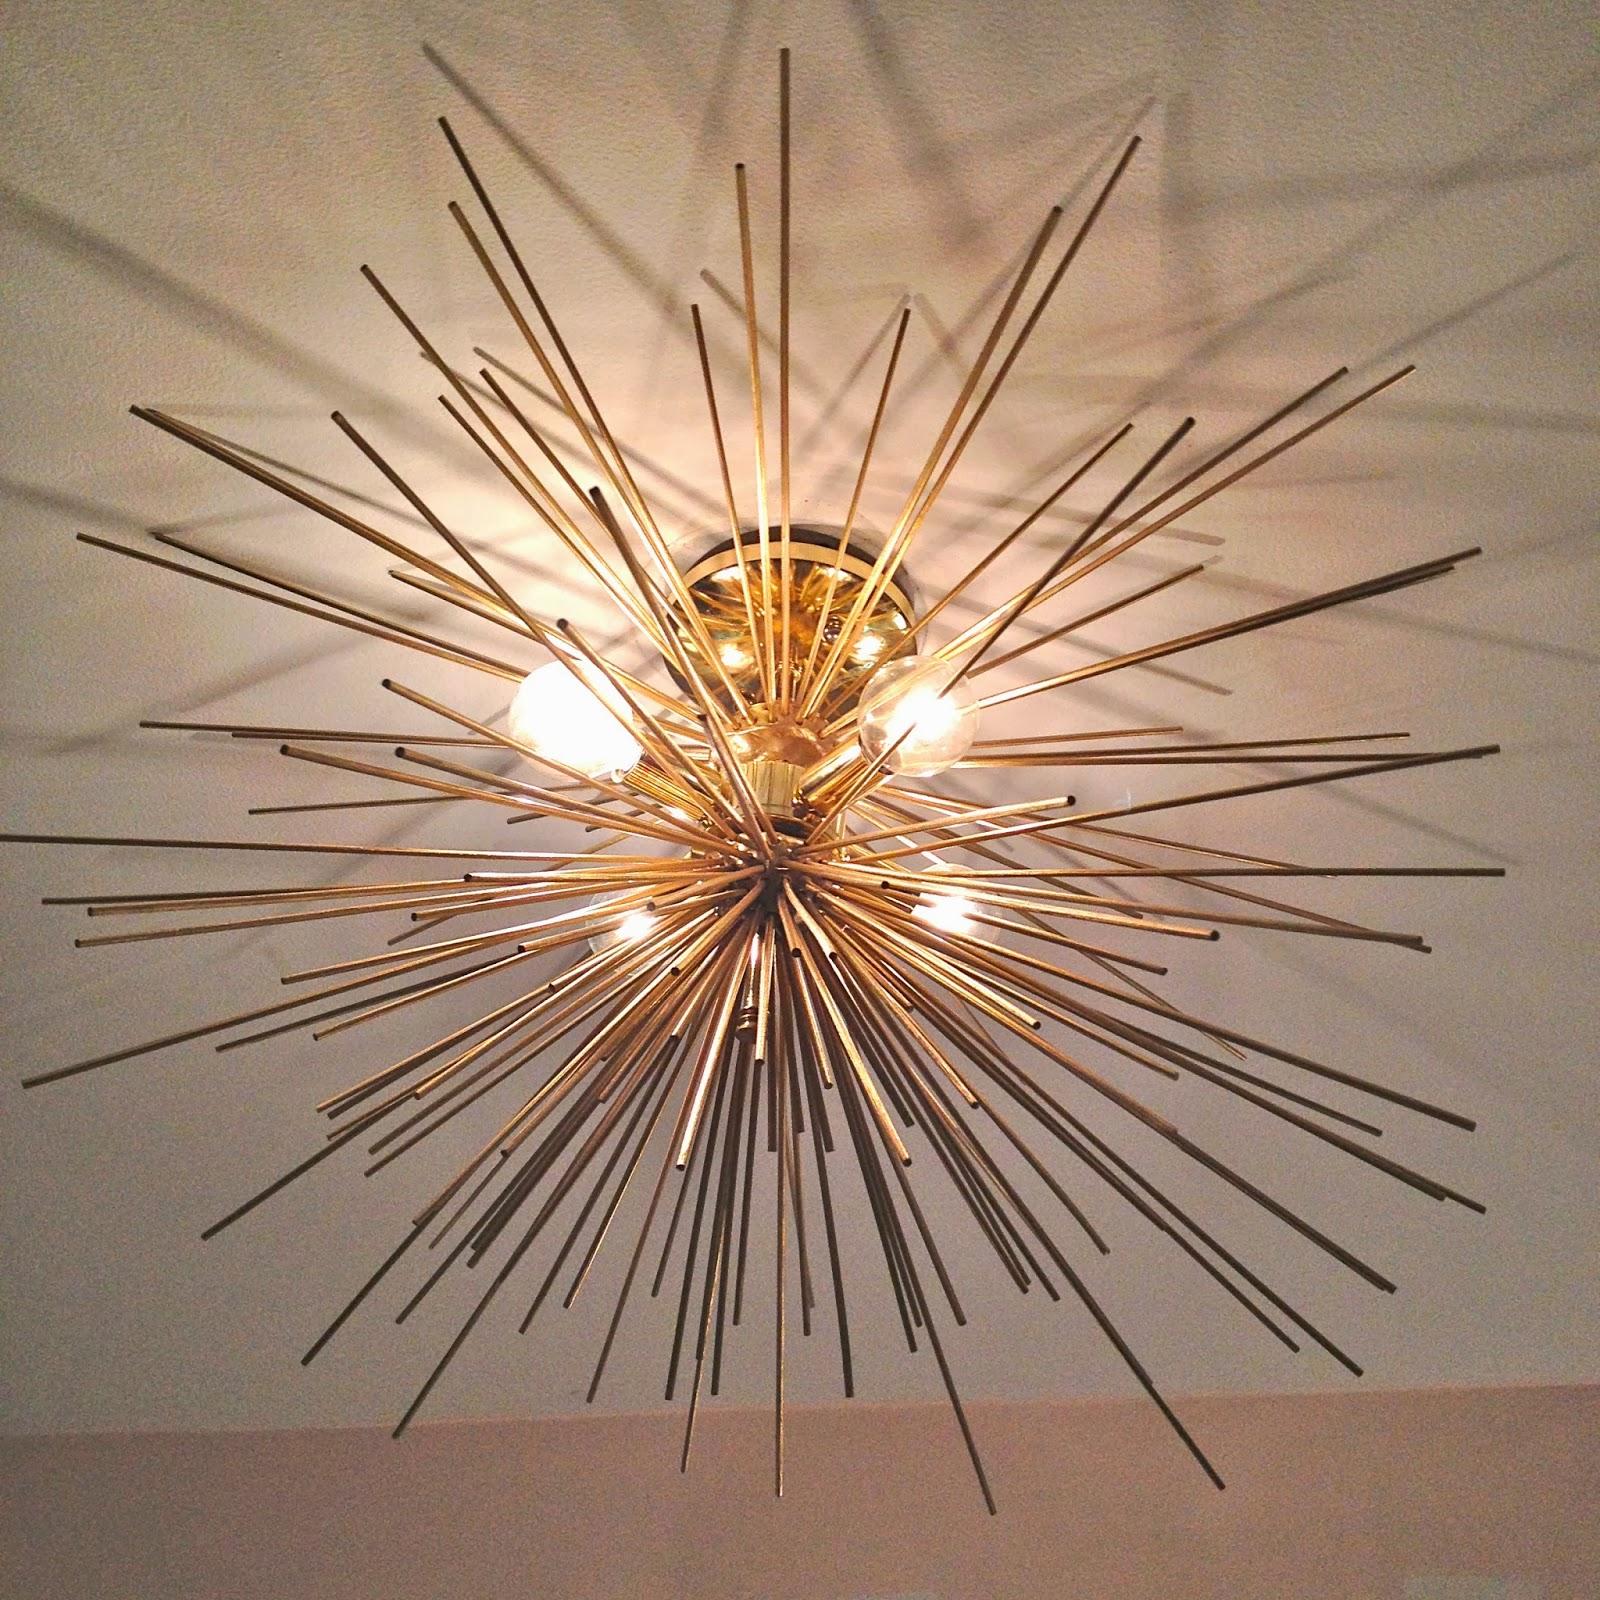 Gorgeous Shiny Things Diy Brass Urchin Light Fixture